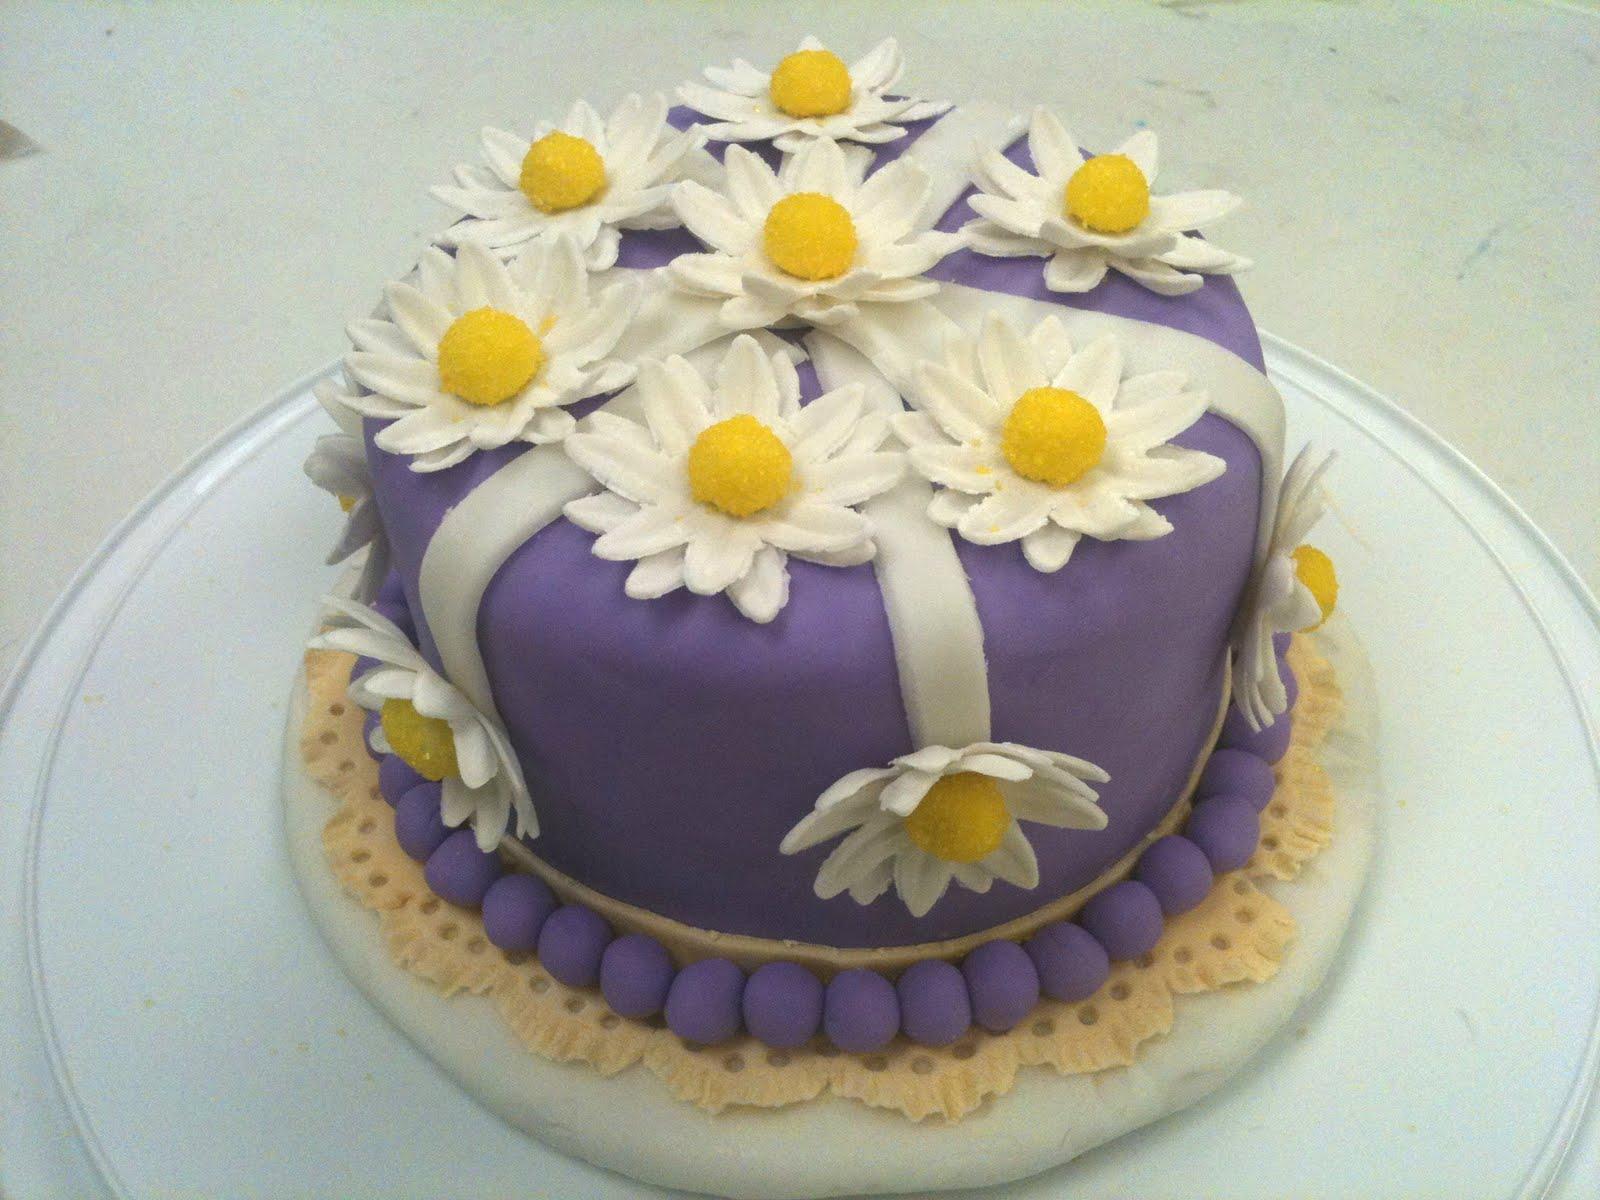 Cake Images Sonia : Cake Decorating by Sonia: October 2010 - Gum Paste ...